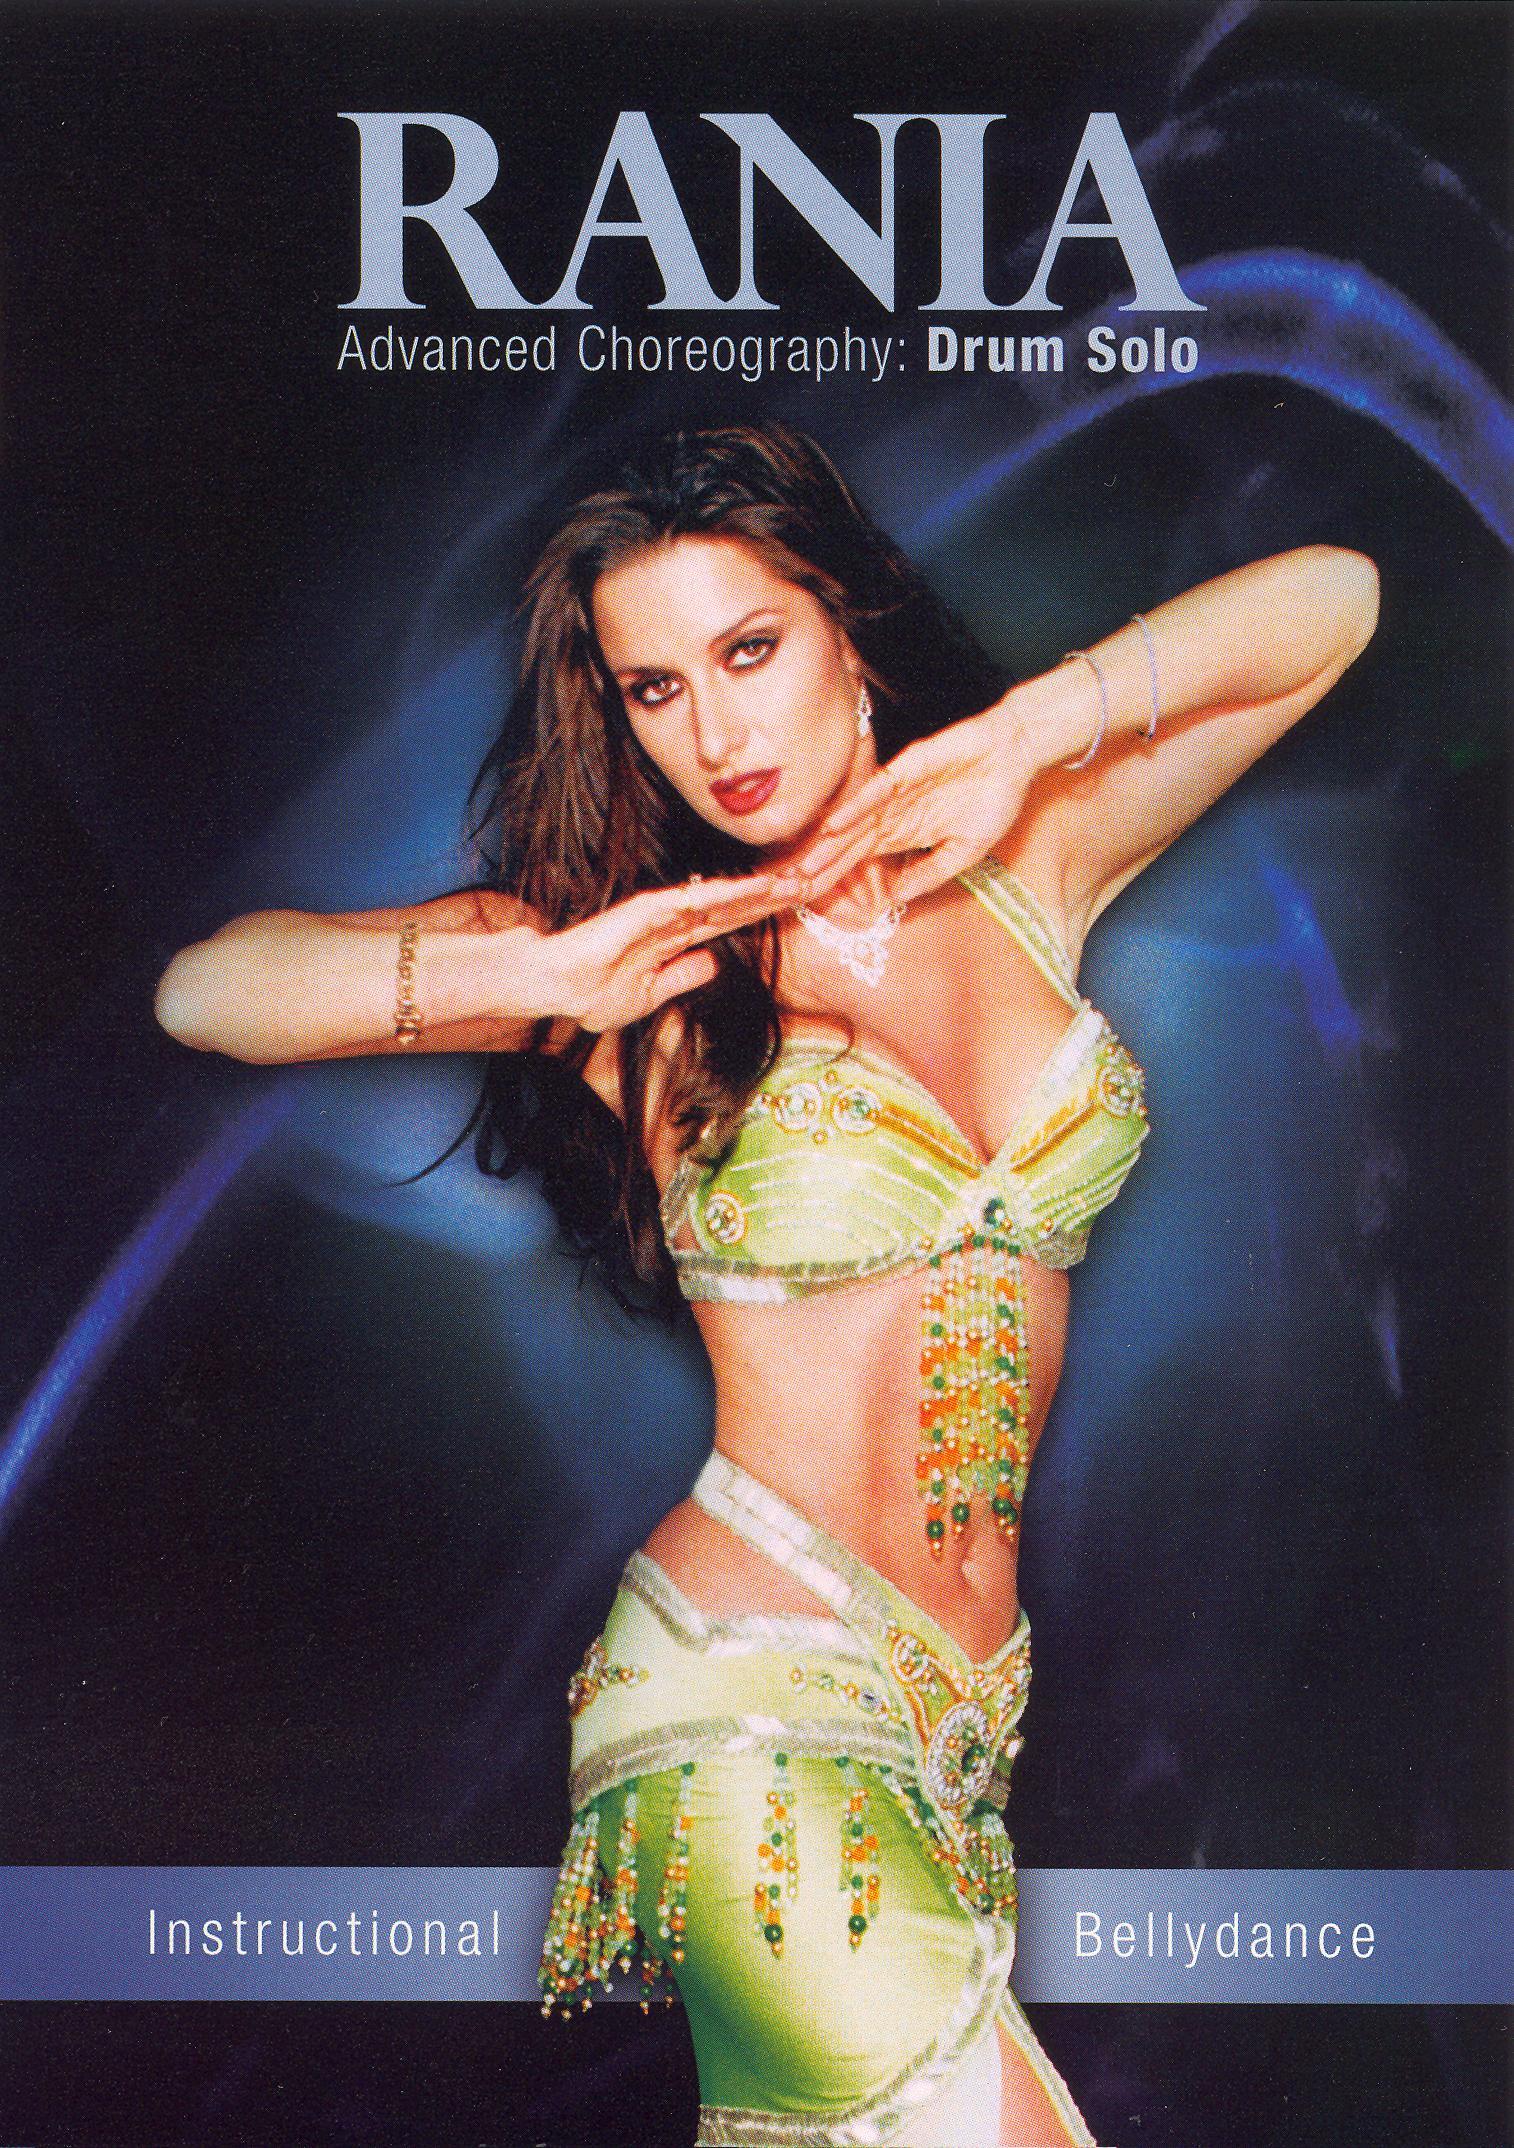 Rania: Advanced Choreography - Drum Solo